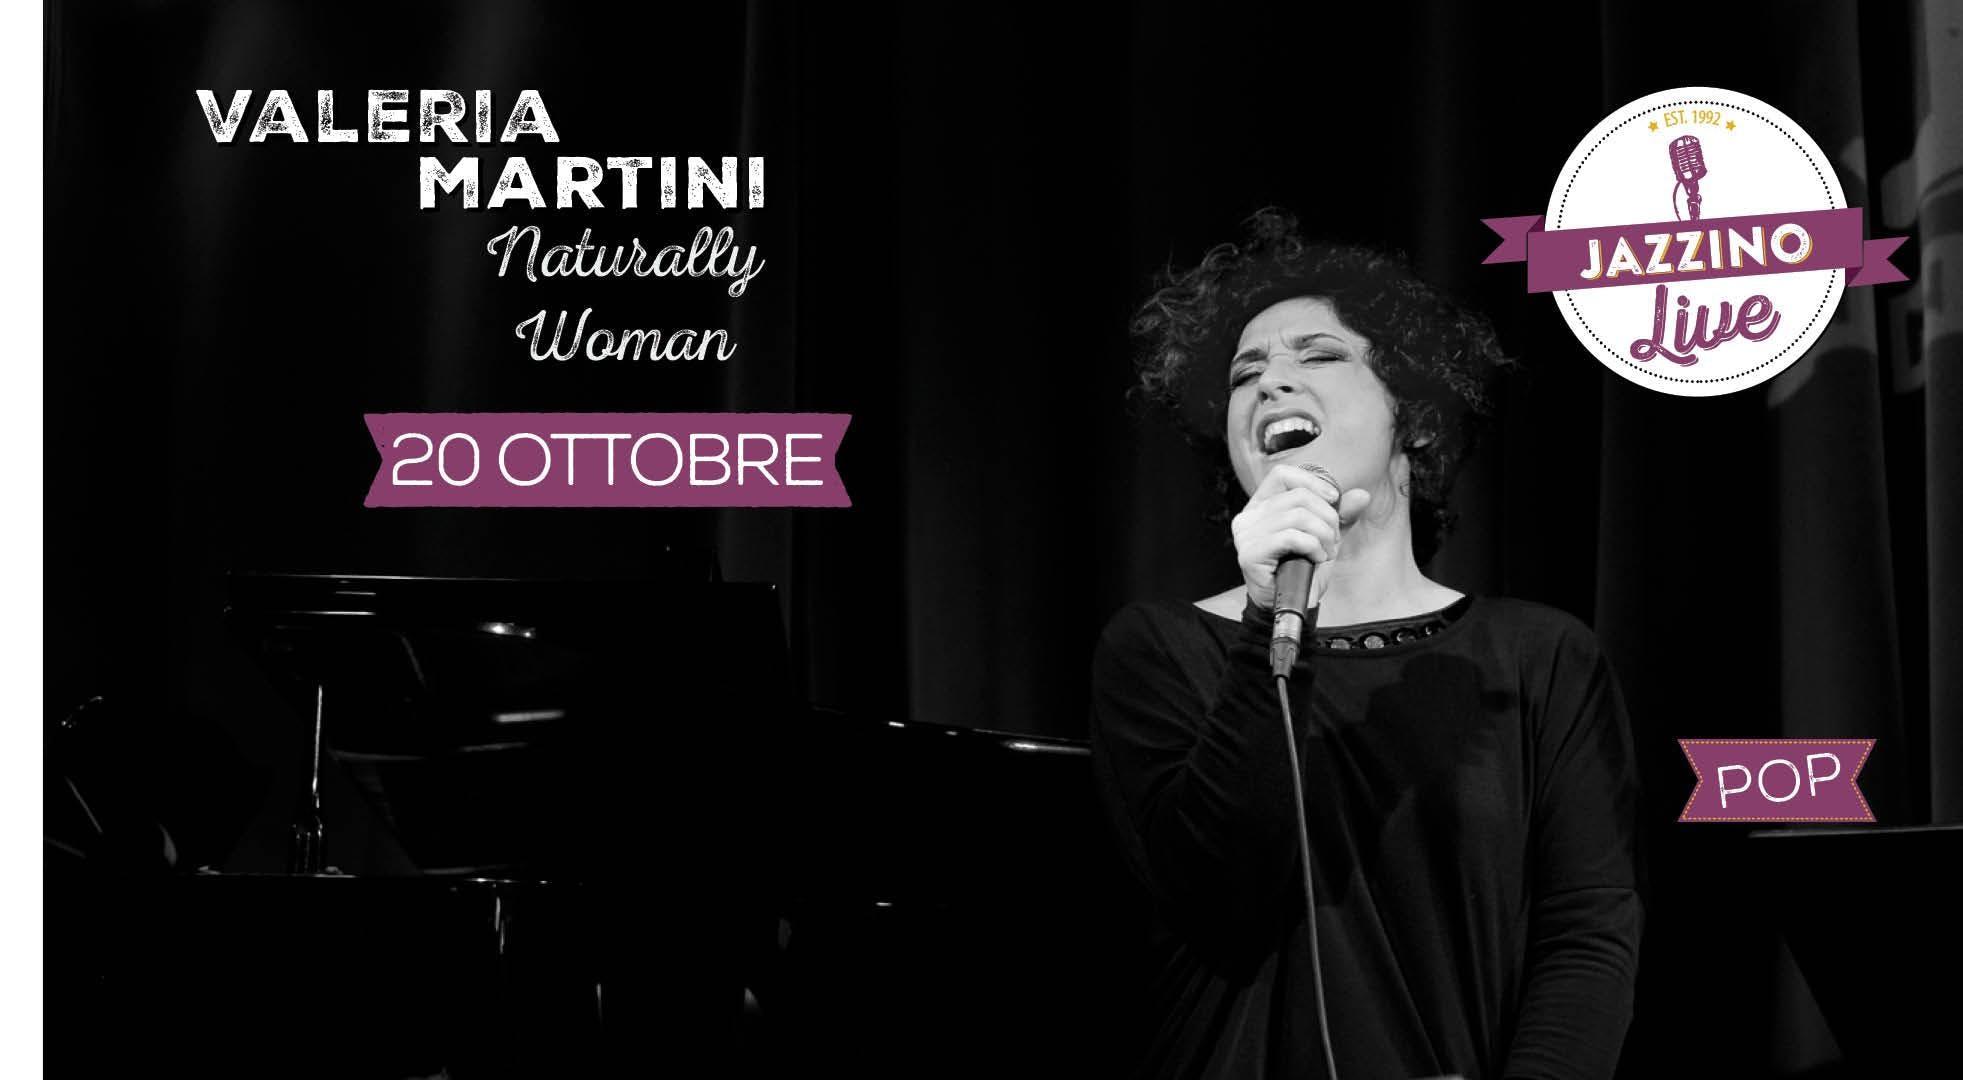 Valera Martini - Naturally Woman live at Jazz